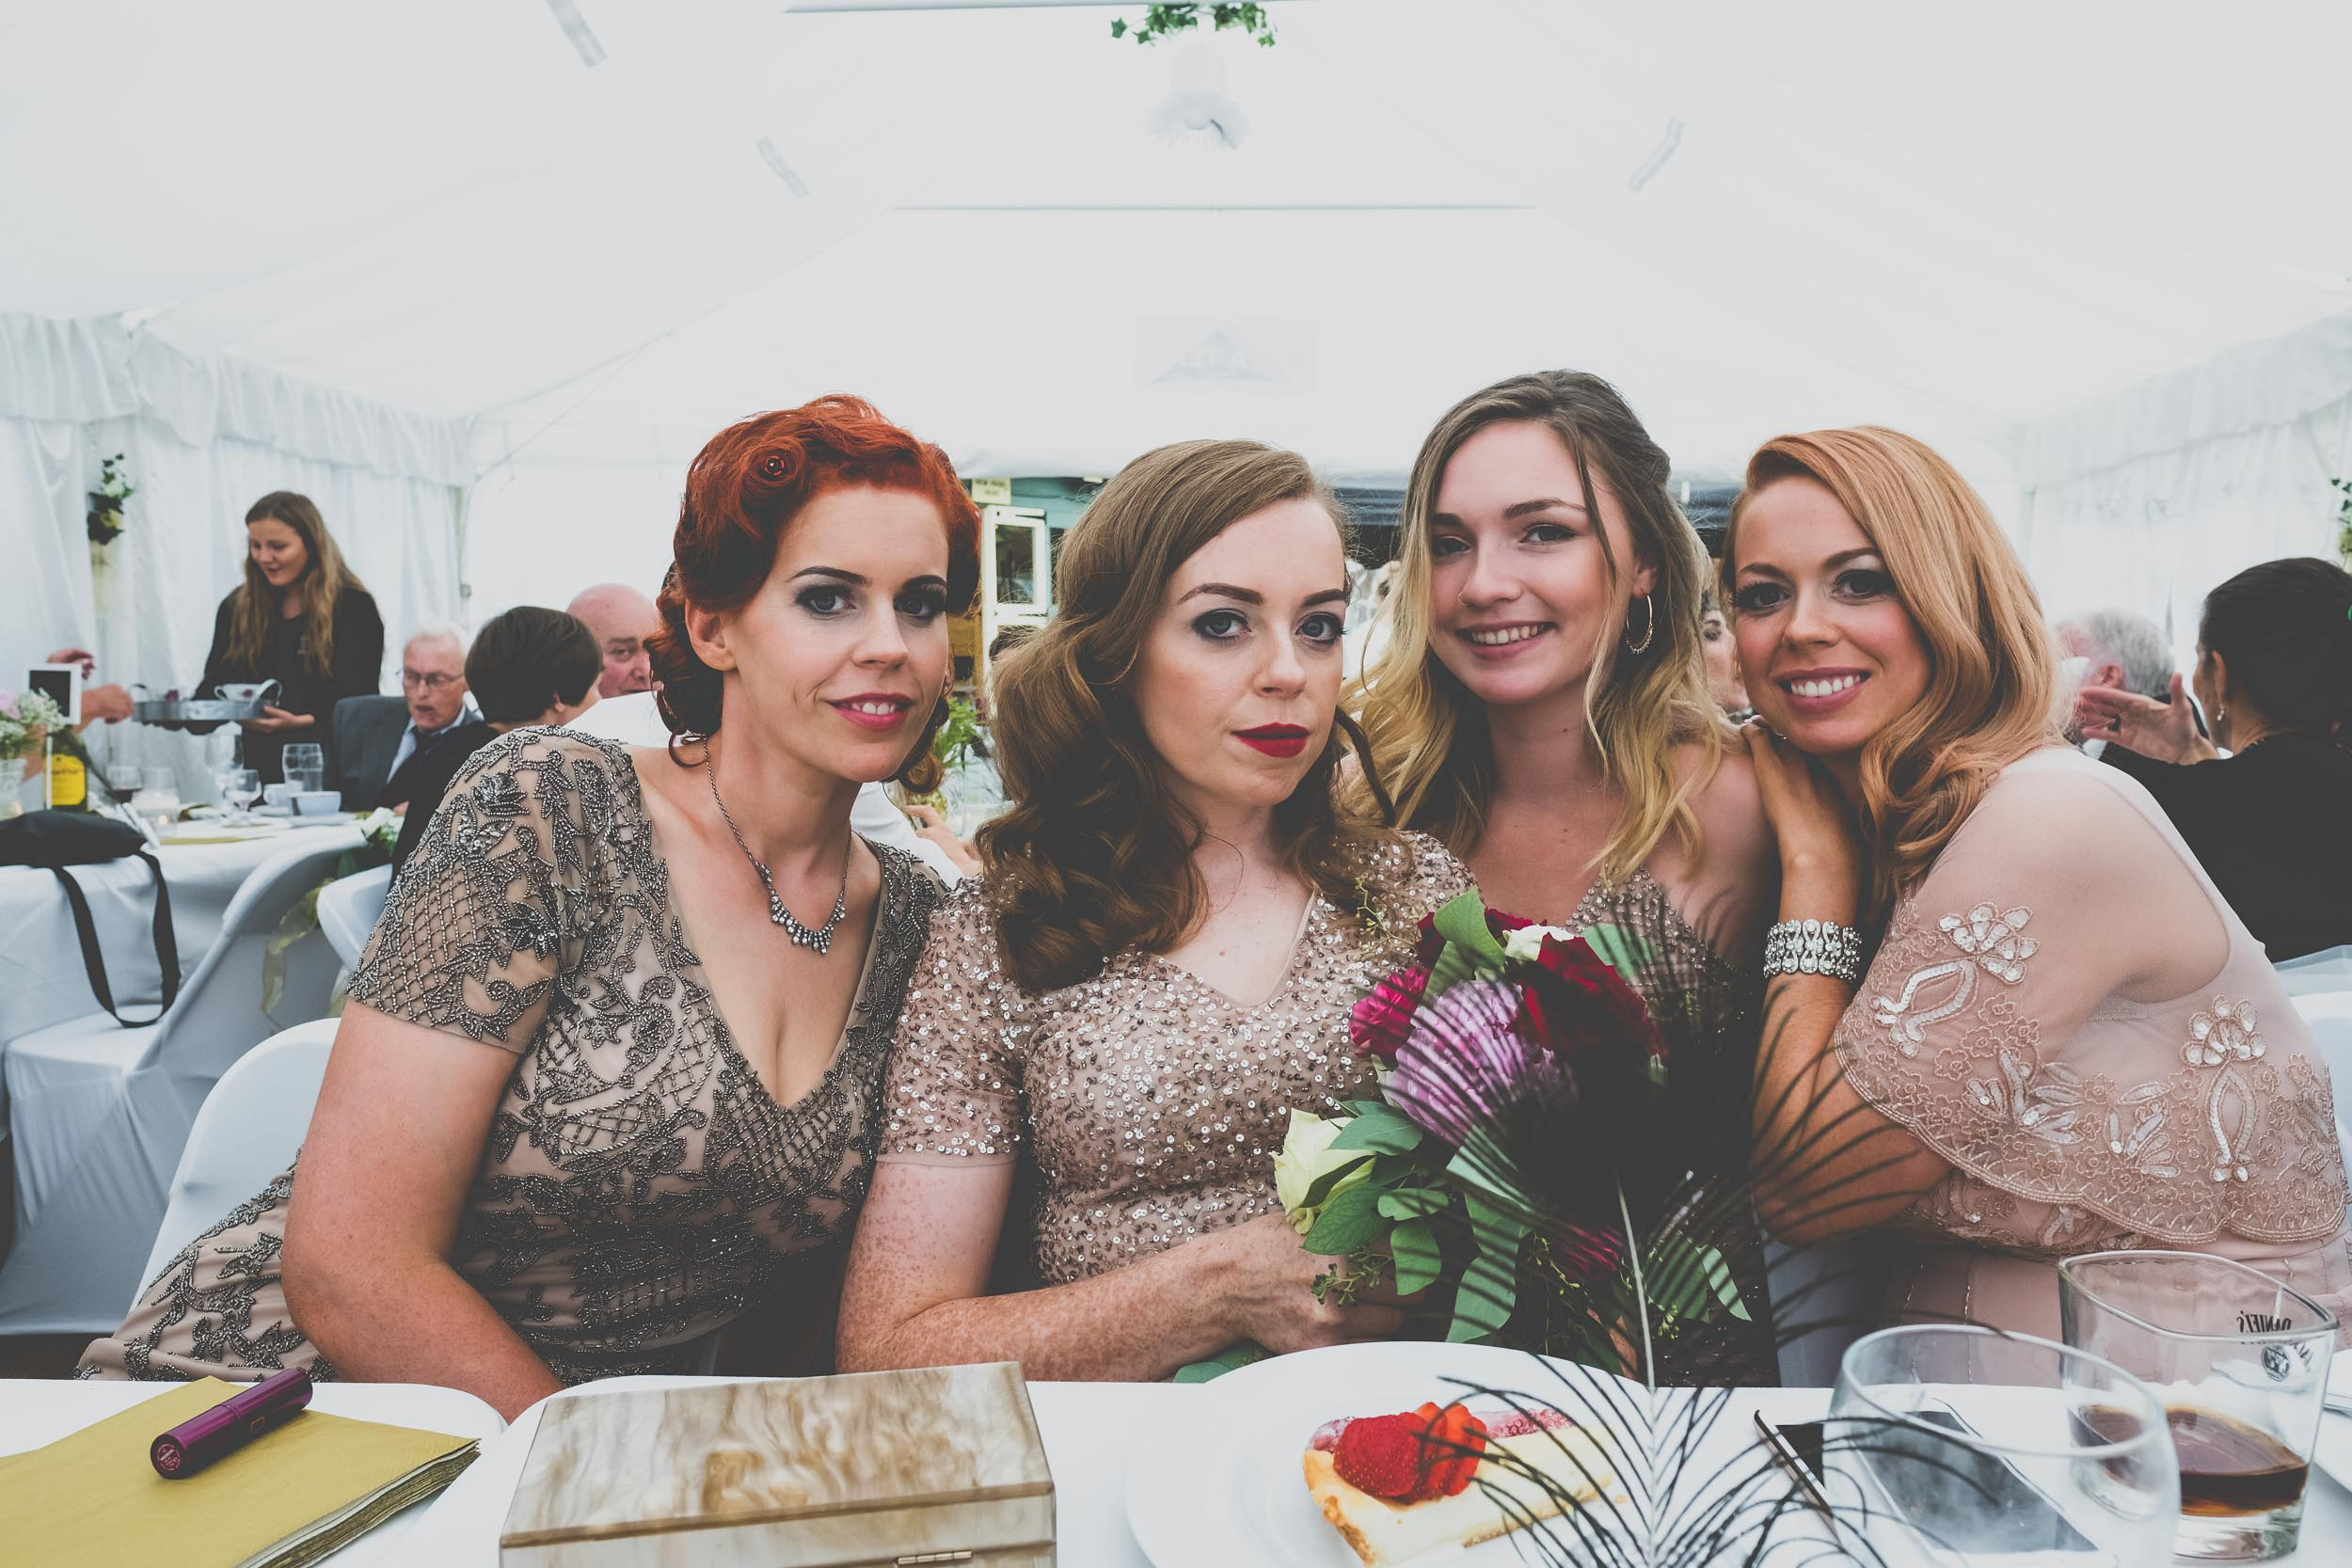 queen-elizabeths-hunting-lodge-epping-forest-wedding324.jpg